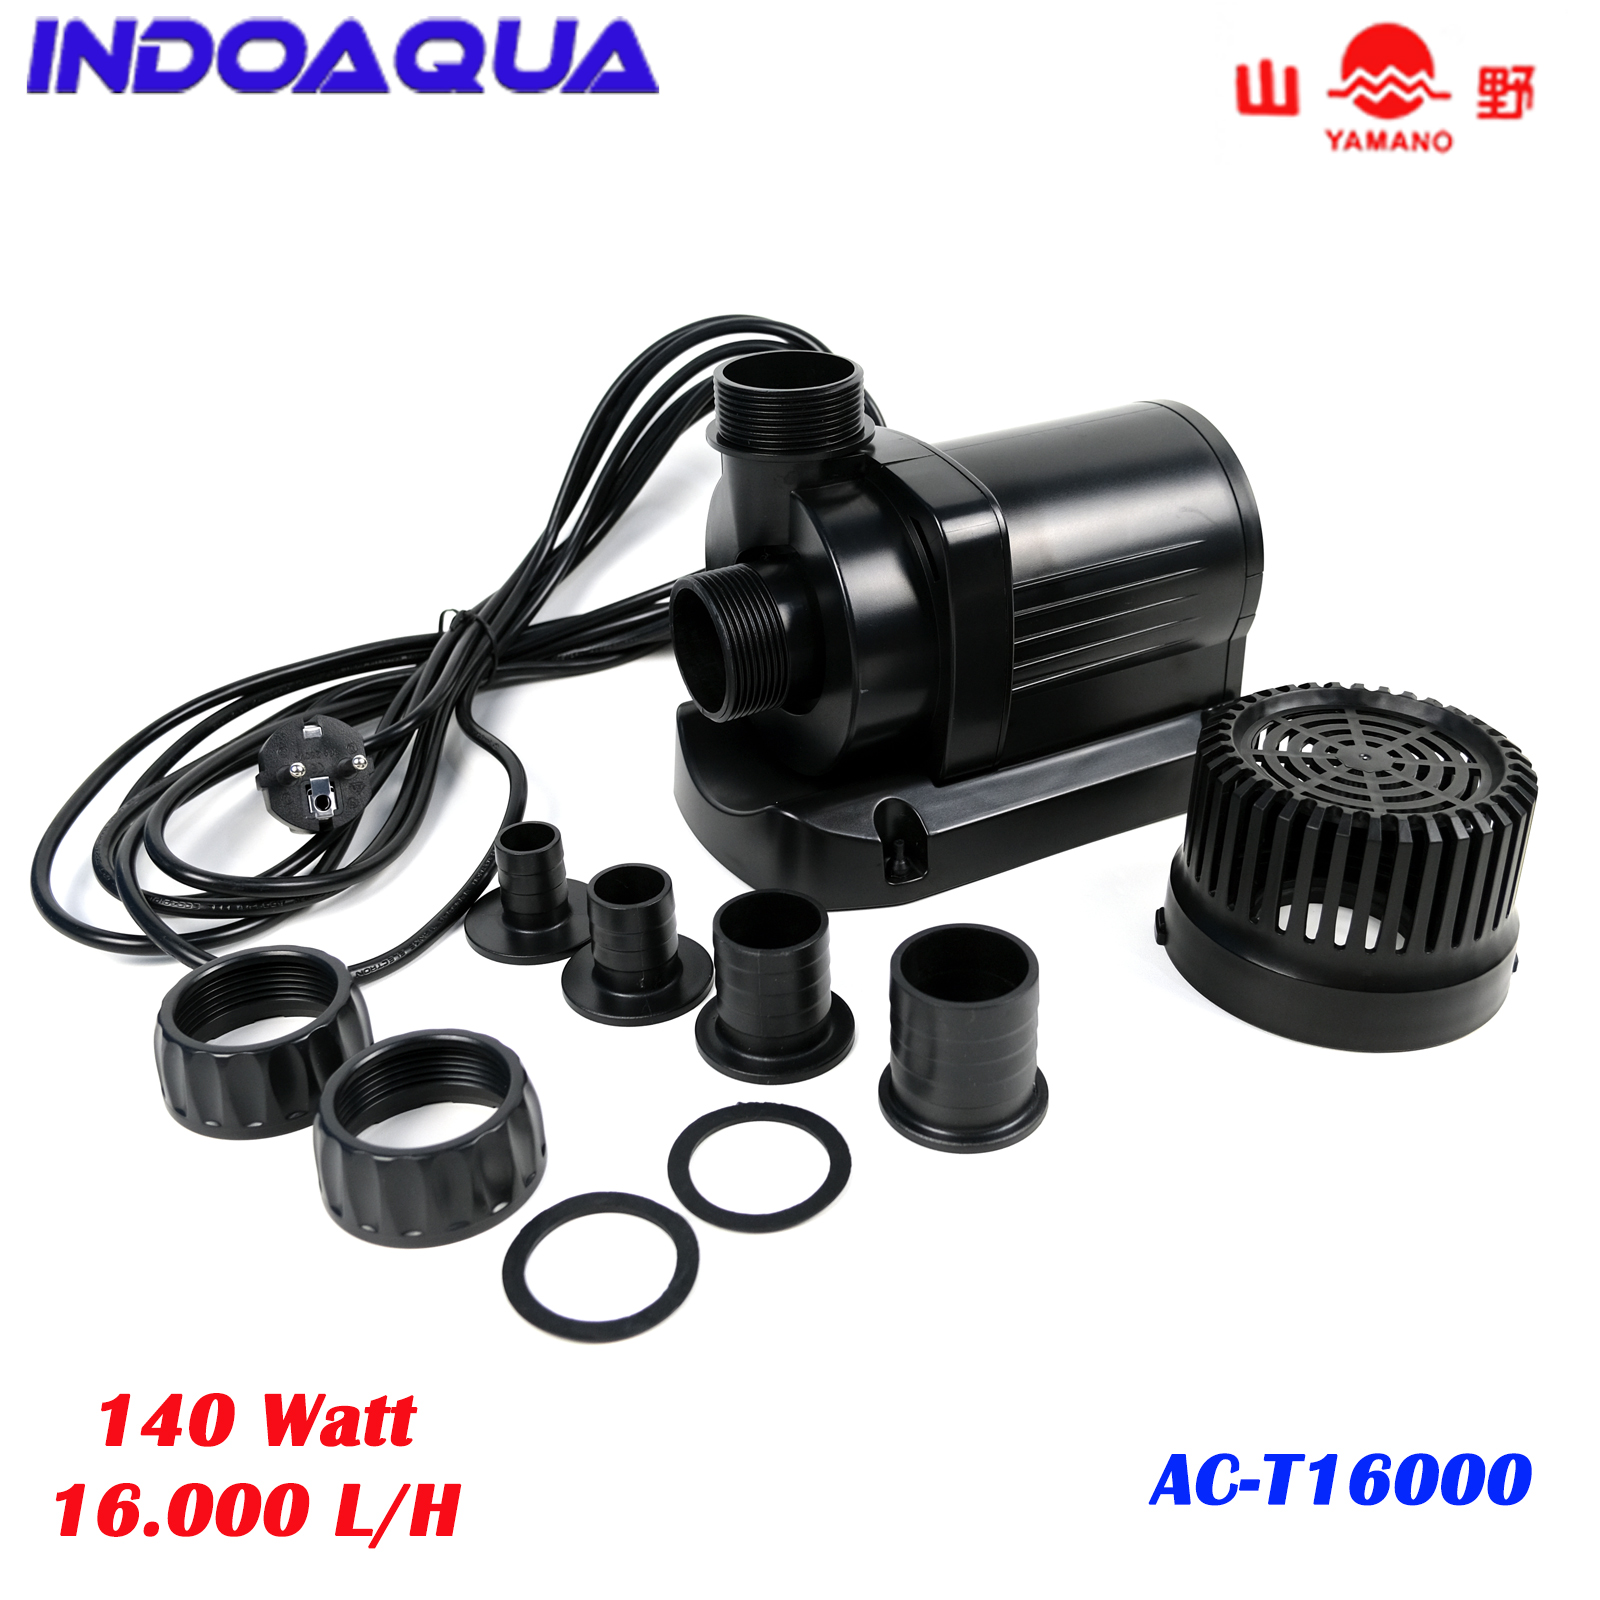 Water Pump Kolam Ikan Koi Low Watt Yamano Act 16000 Pompa Celup Kolam Air Terjun Hemat Listrik Lazada Indonesia